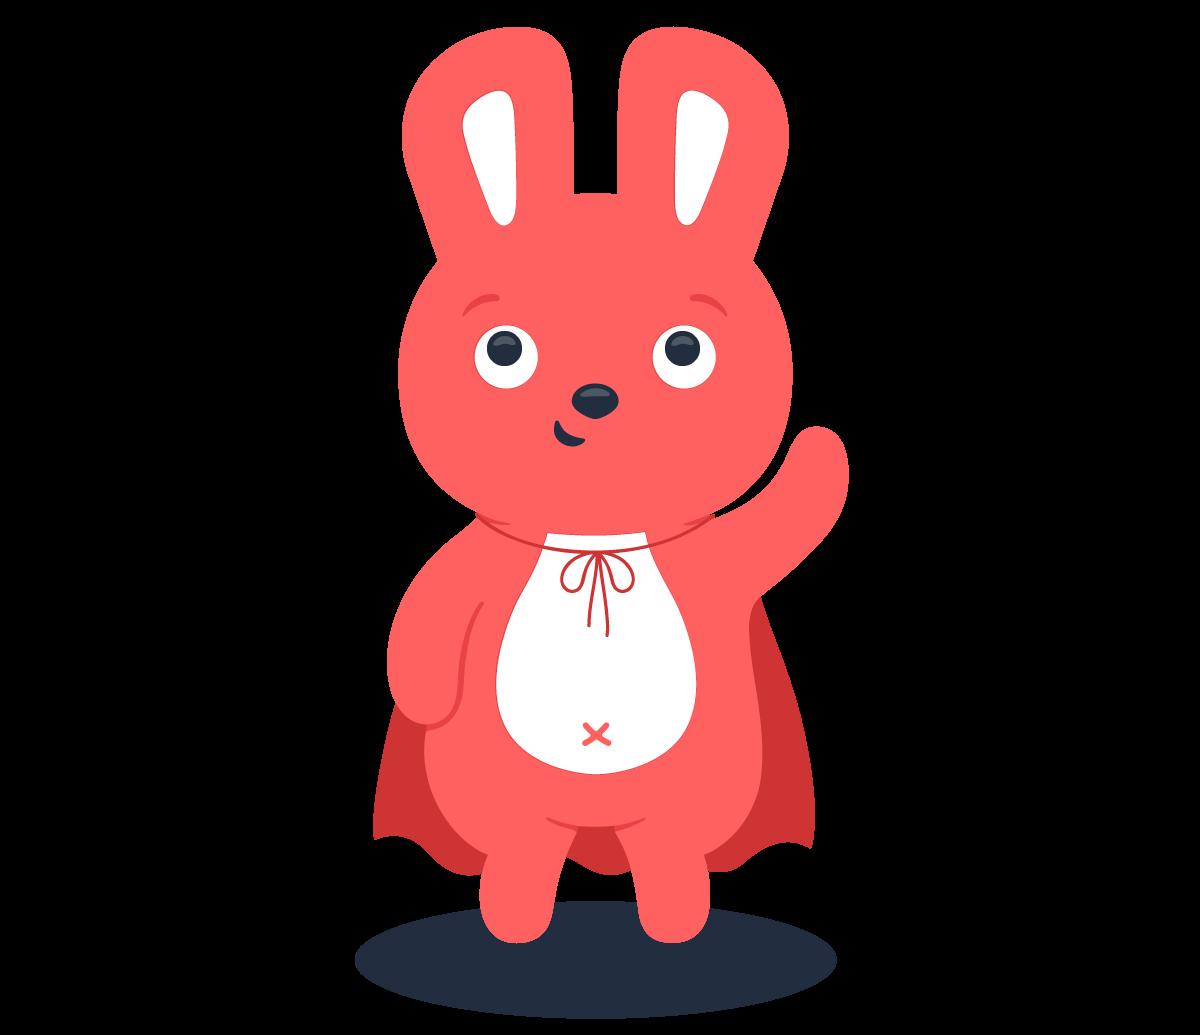 Hoppy bunny in a cape